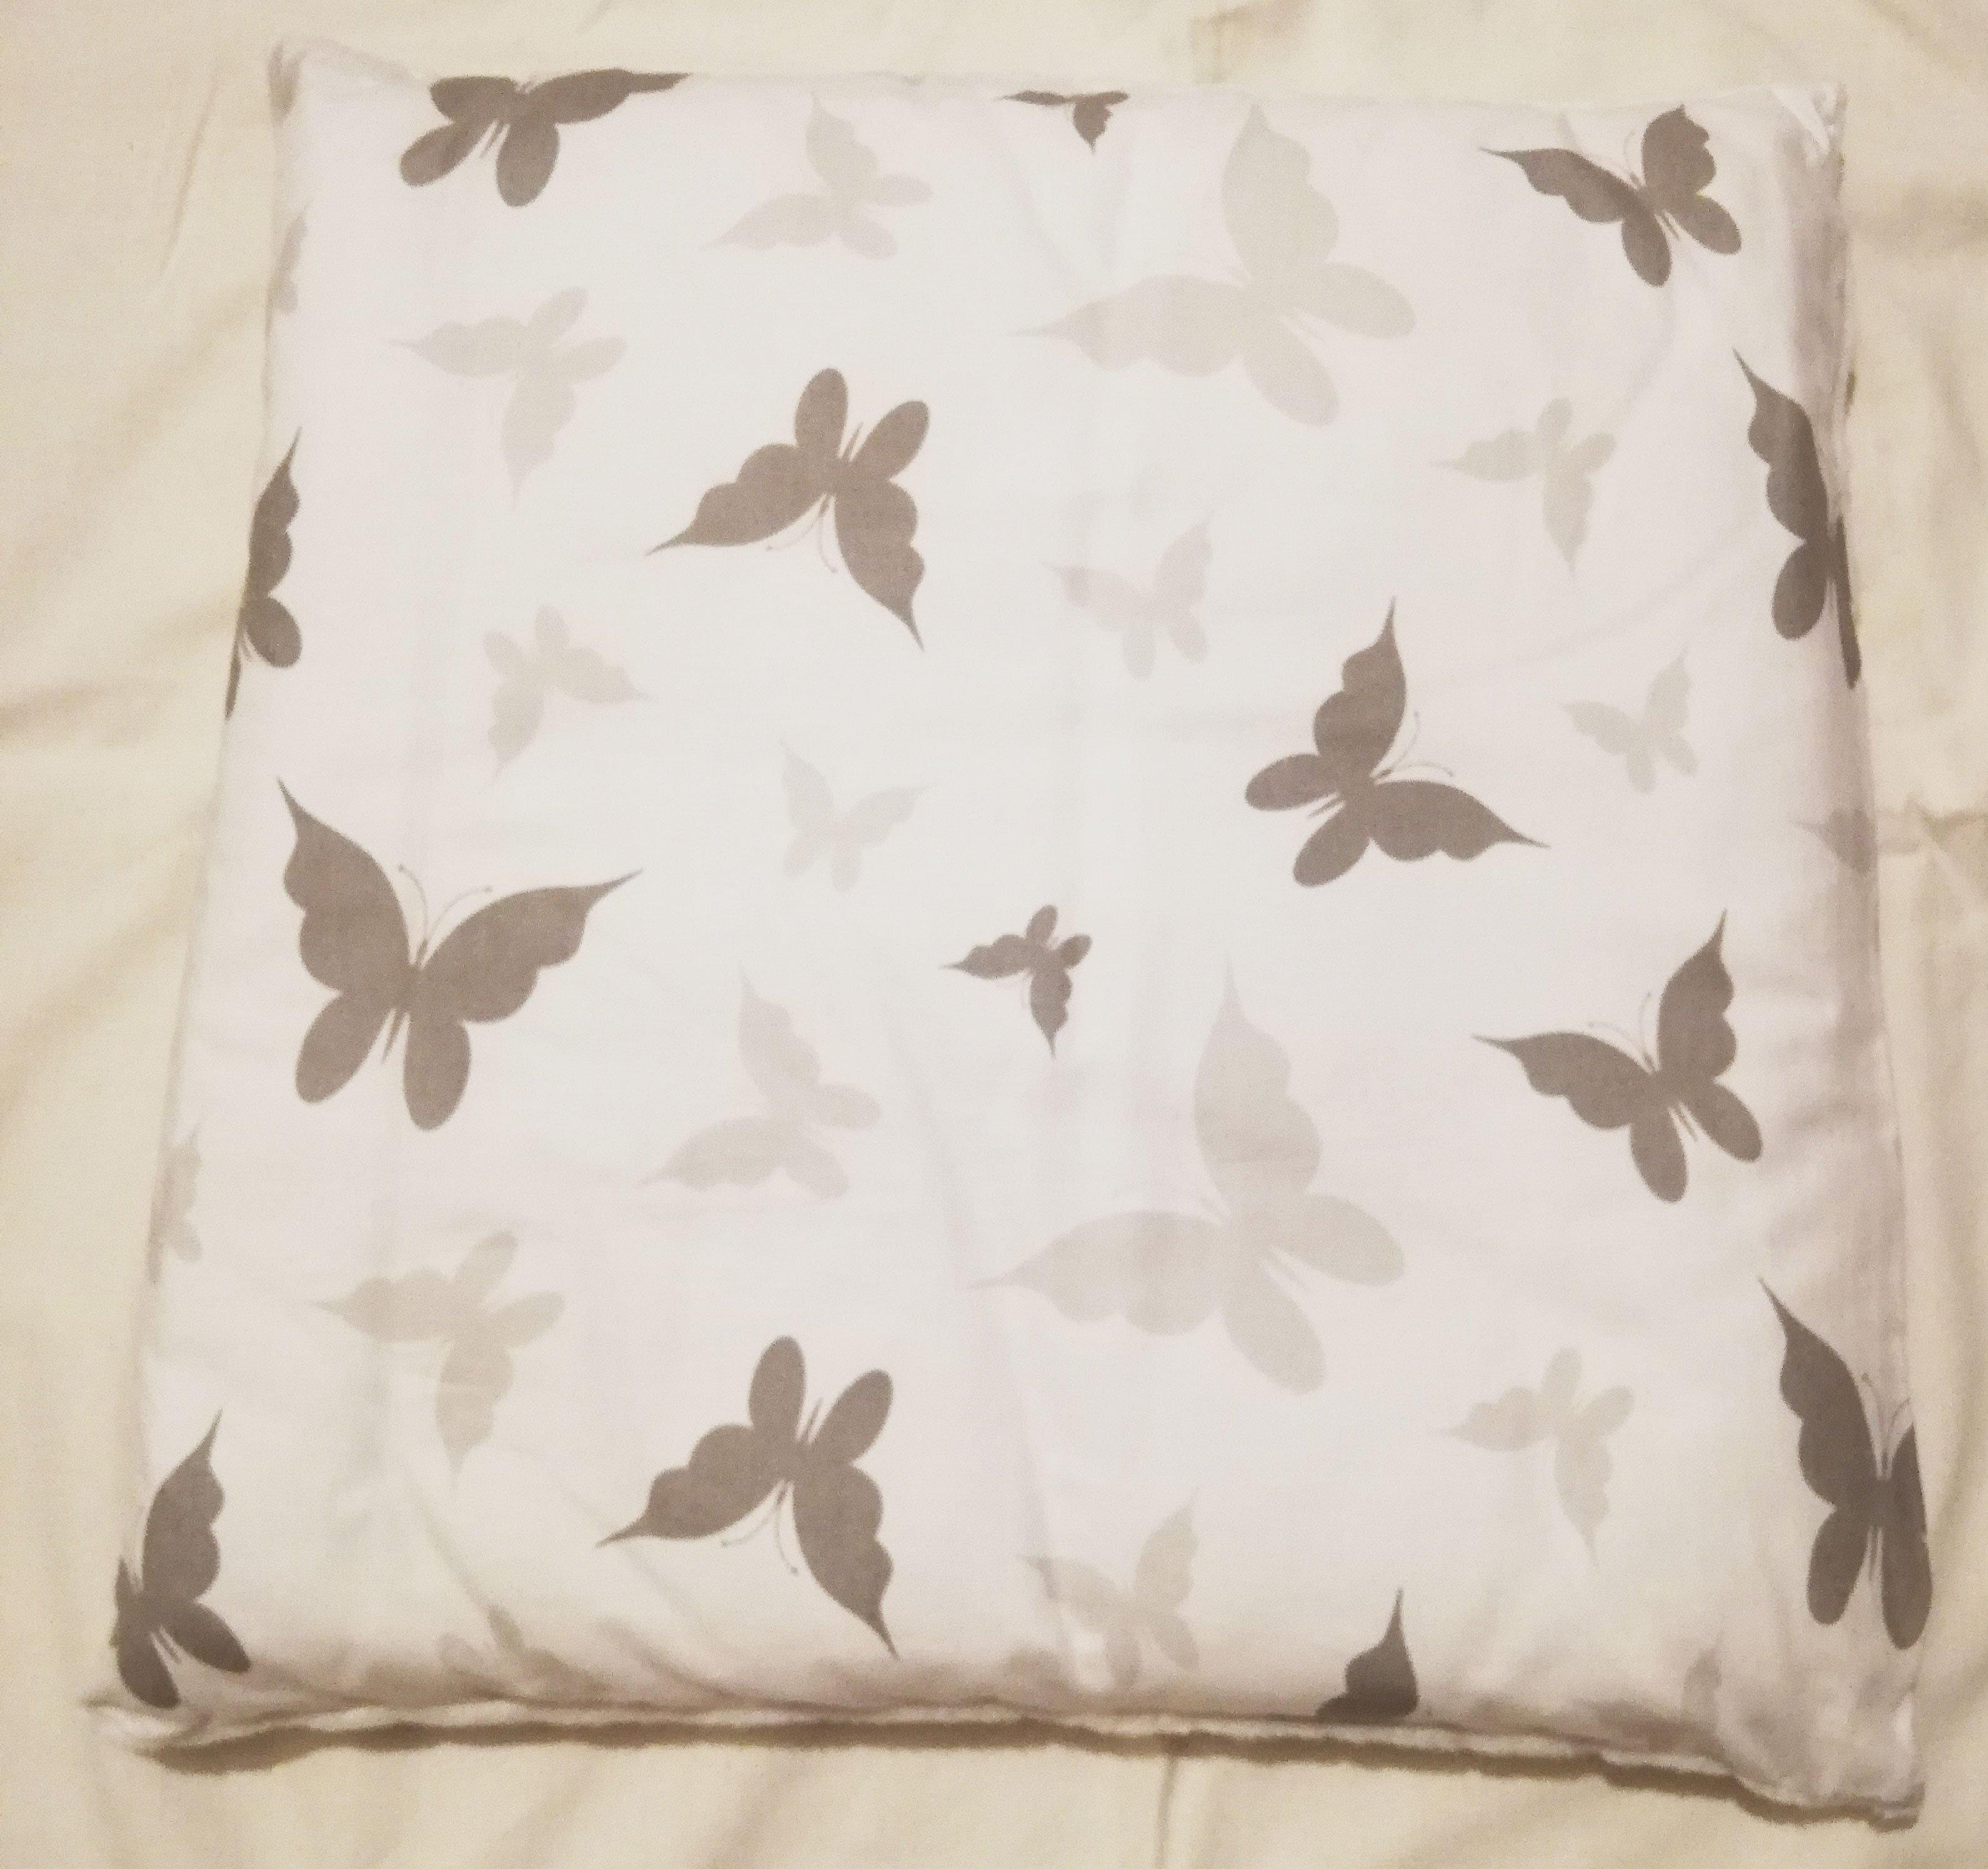 Dìtský polštáø bavlna + minky 40x40 cm šedí motýlci